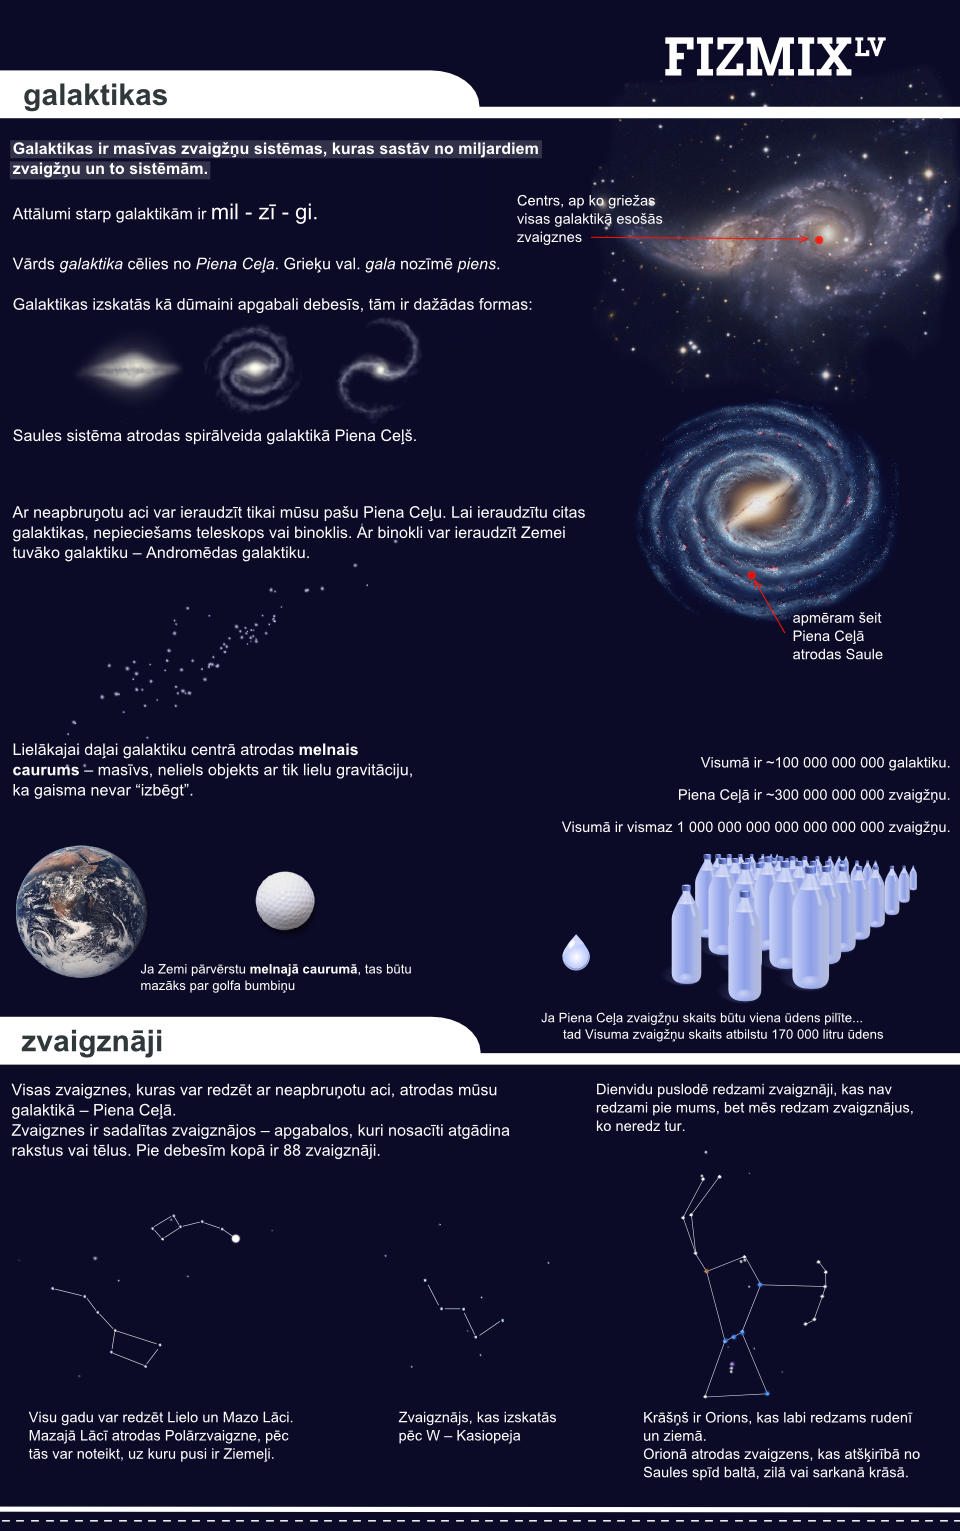 Galaktikas un zvaigznāji